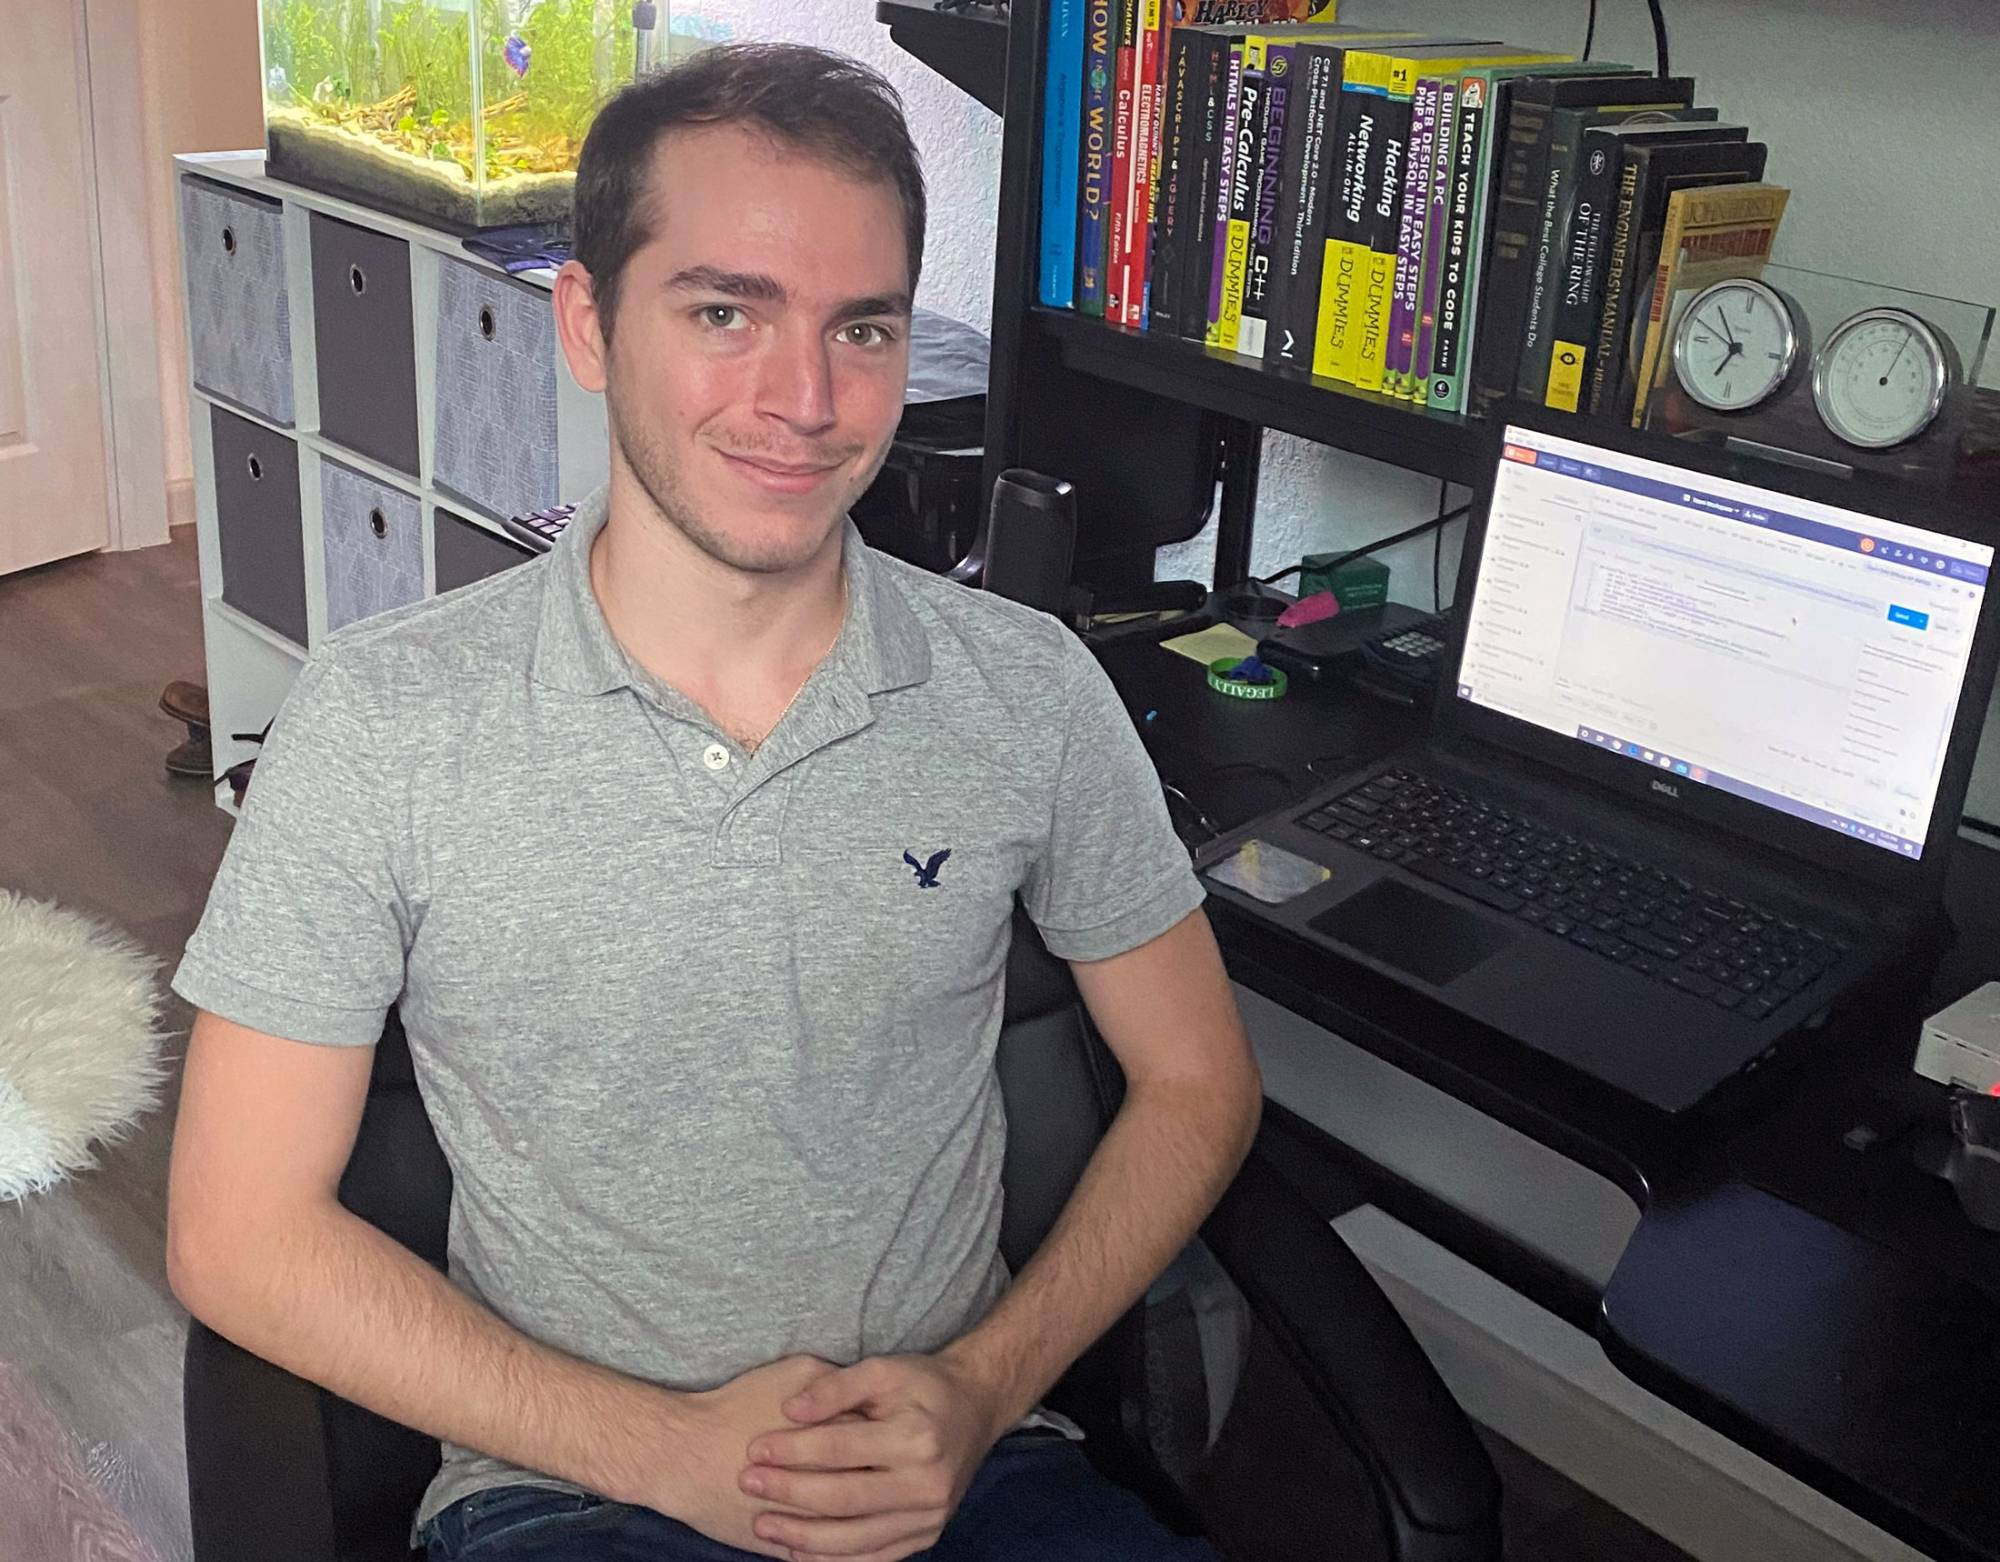 Internship sparks excitement for remote coding work